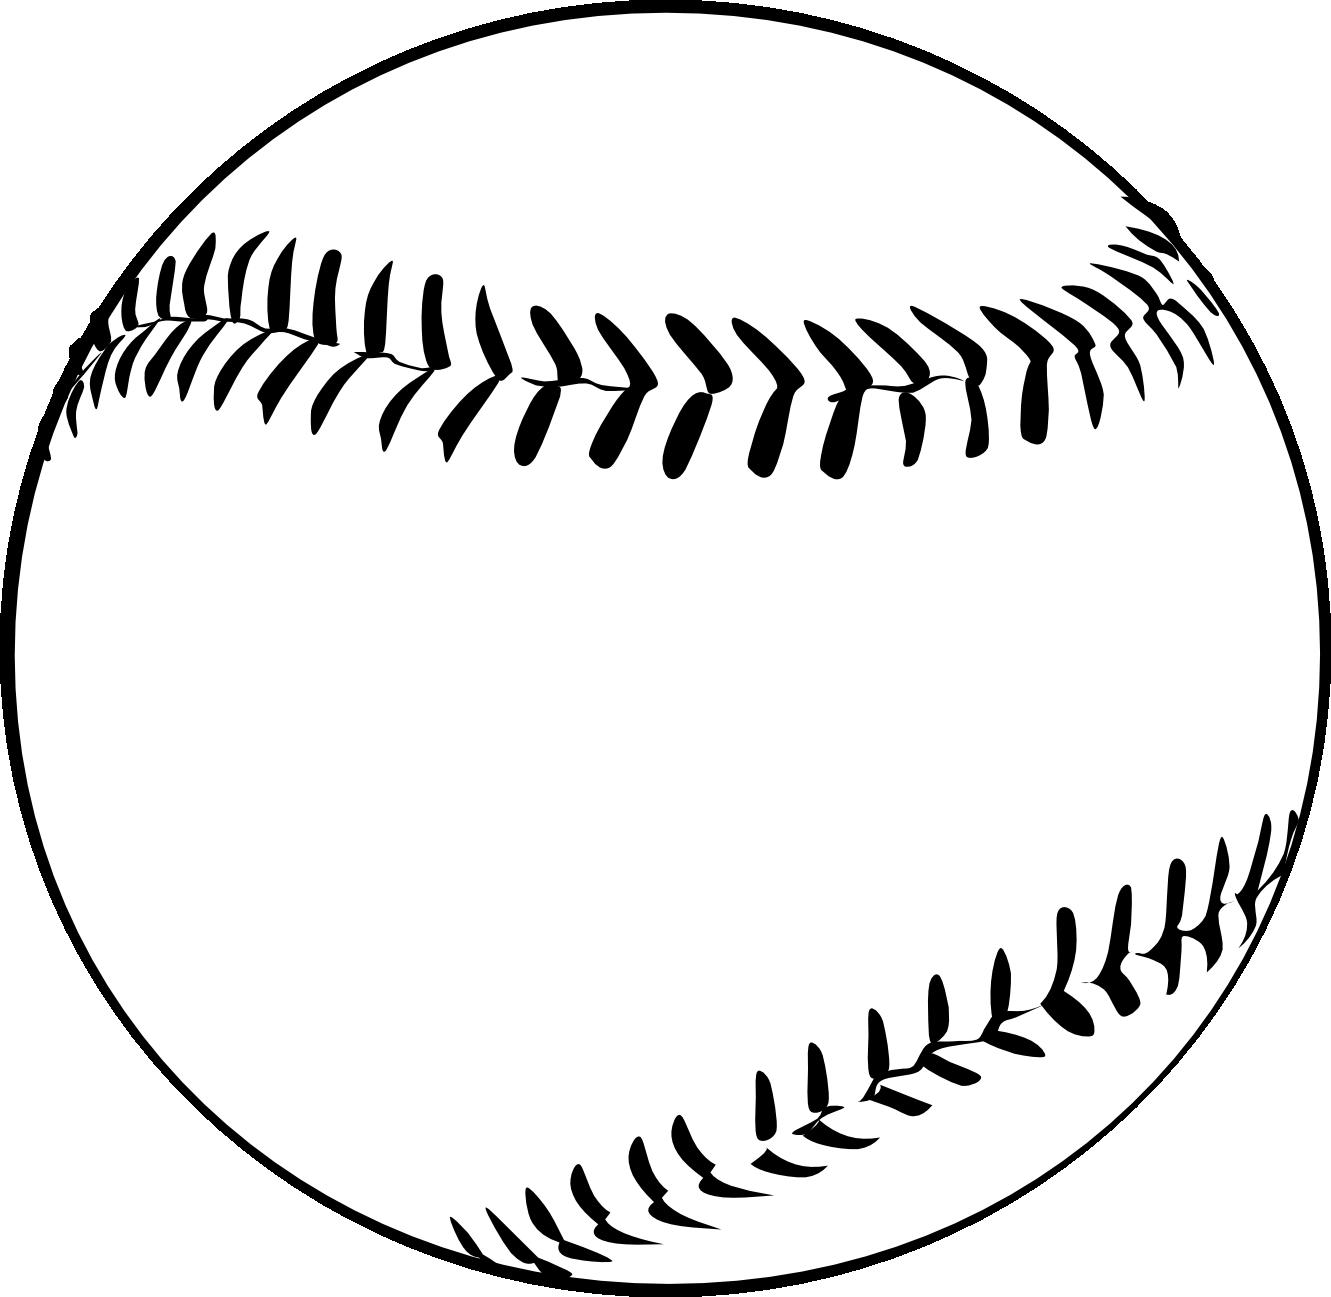 Baseball black and white. Softball clipart softball diamond